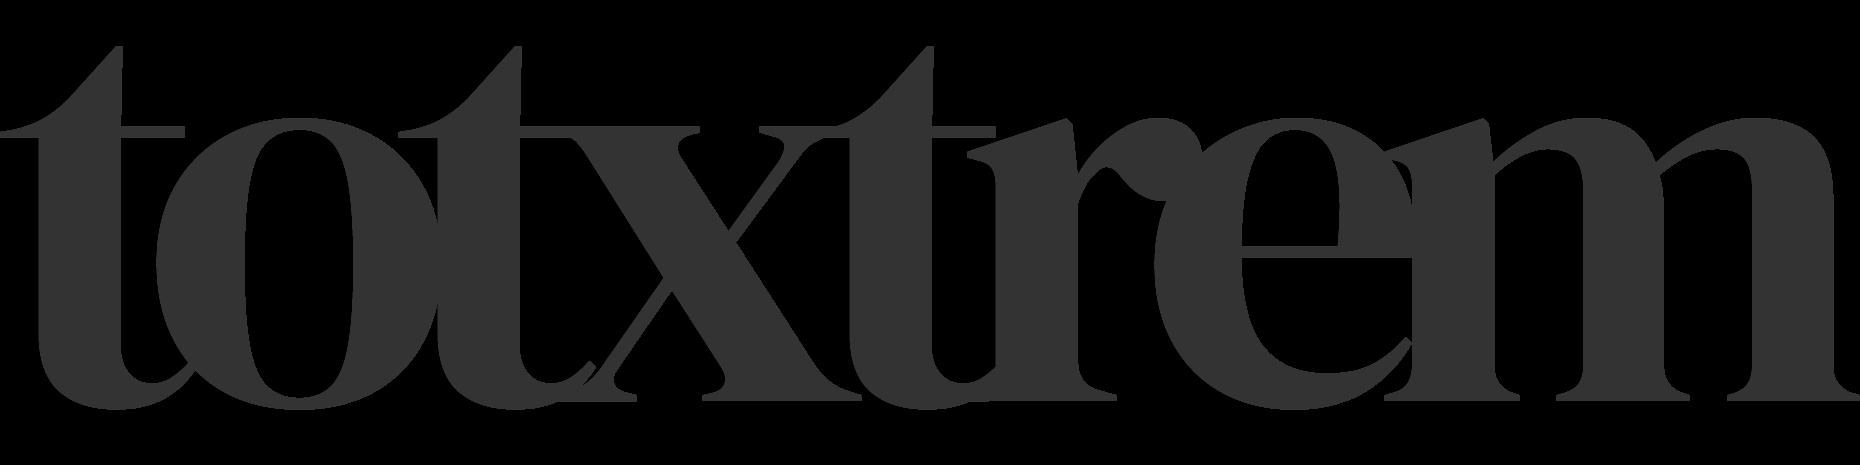 TOTEXTREM